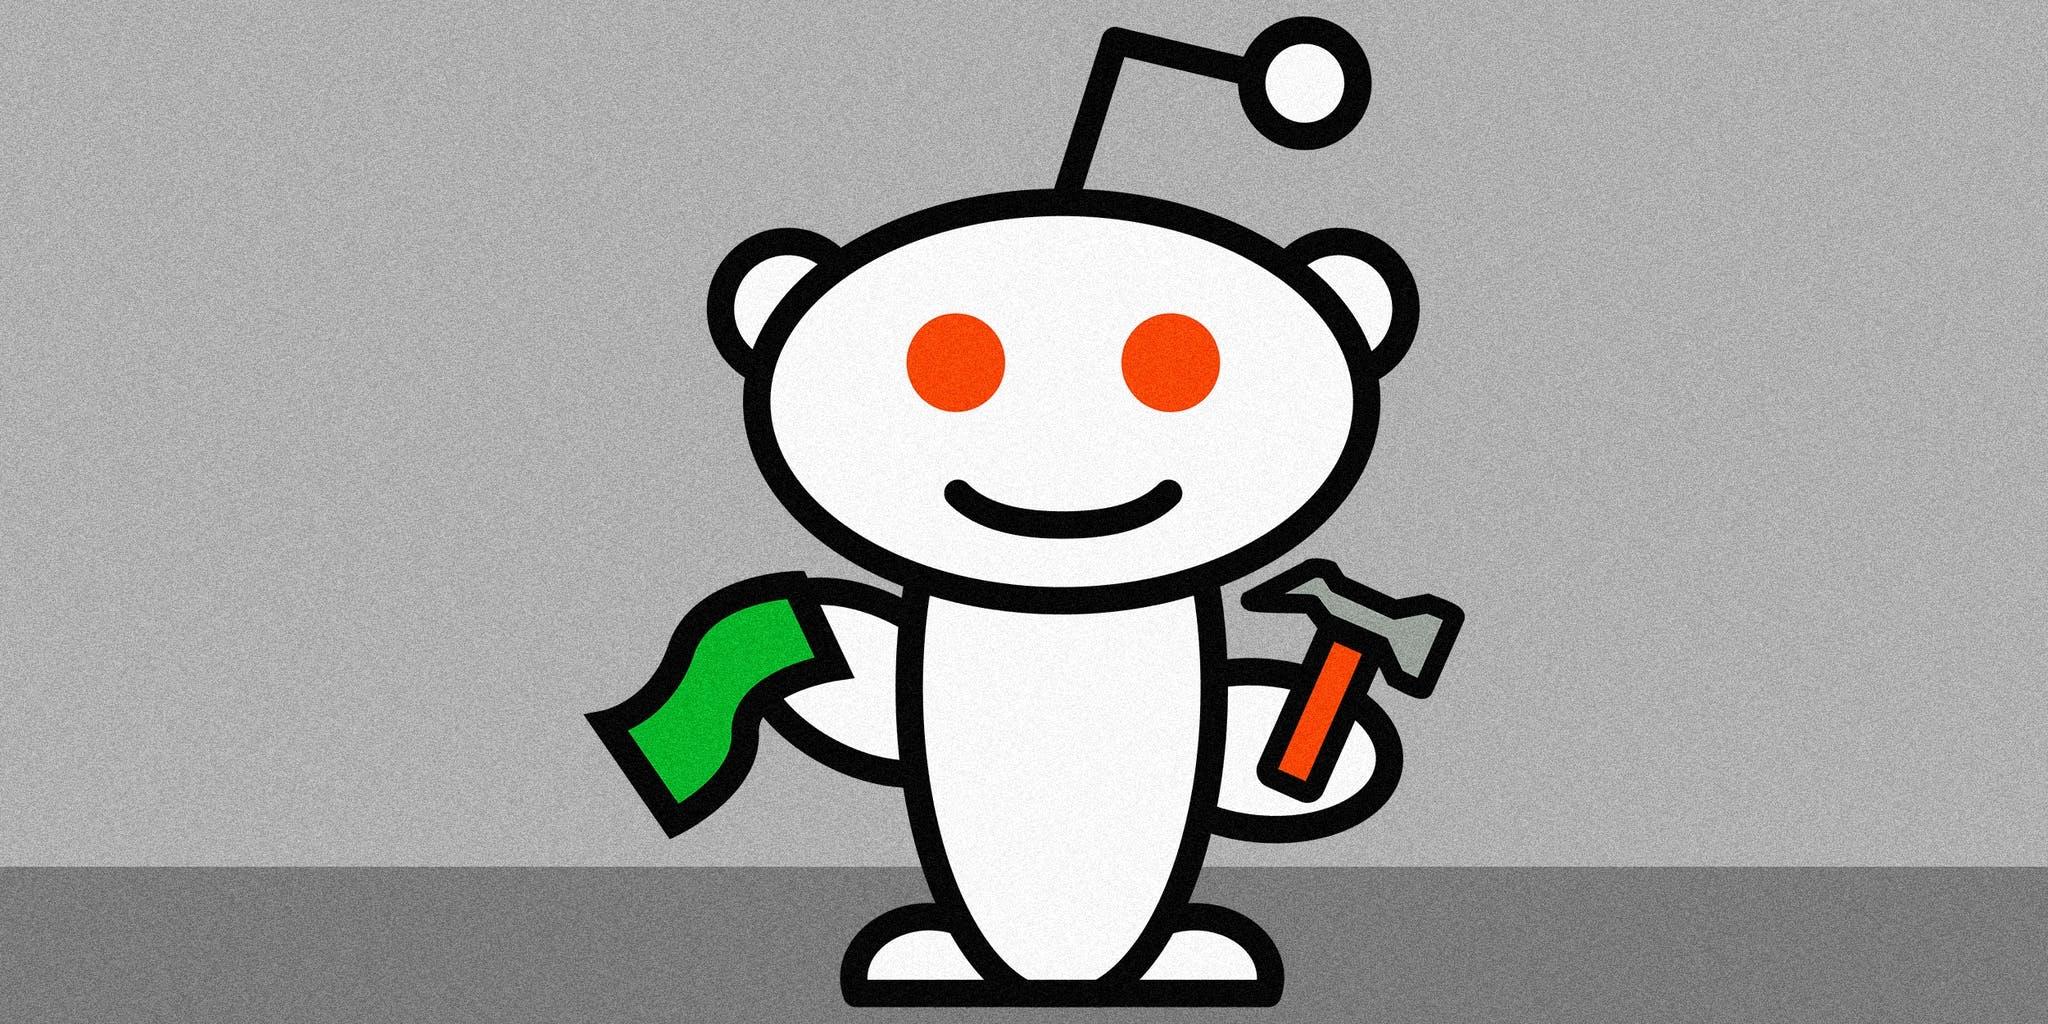 Reddit 50/50 challenge